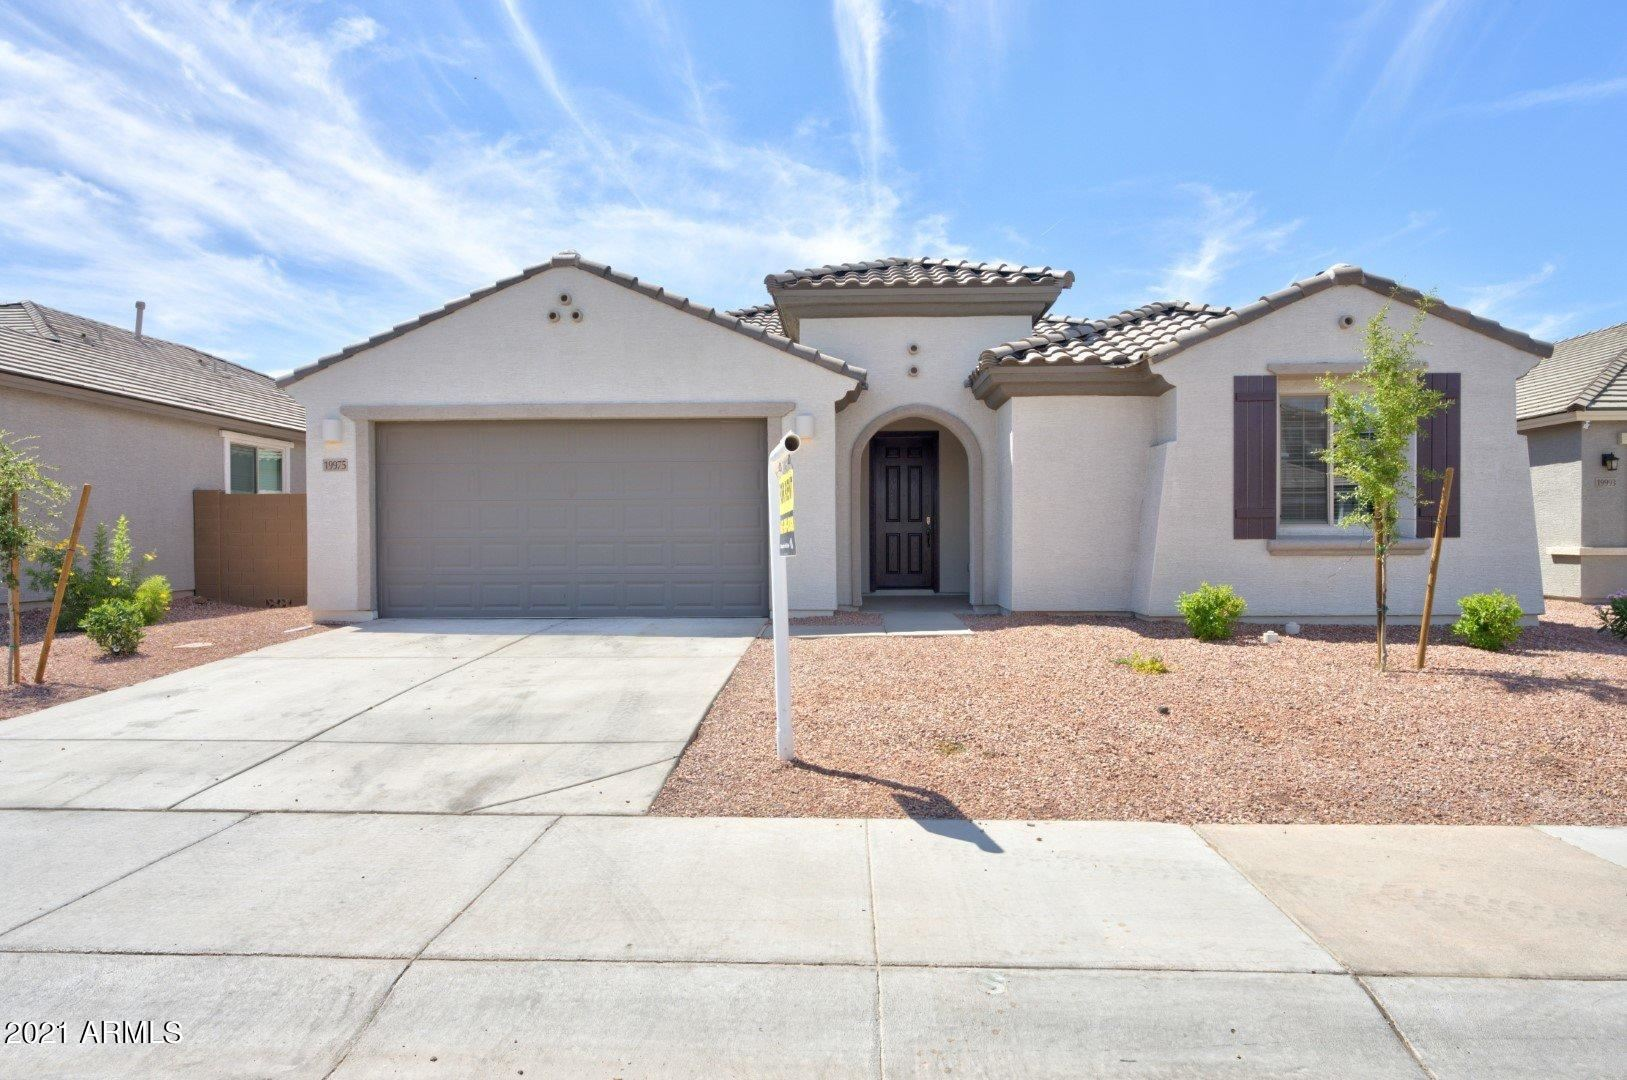 Photo of 19975 W BUCHANAN Street, Buckeye, AZ 85326 (MLS # 6249628)